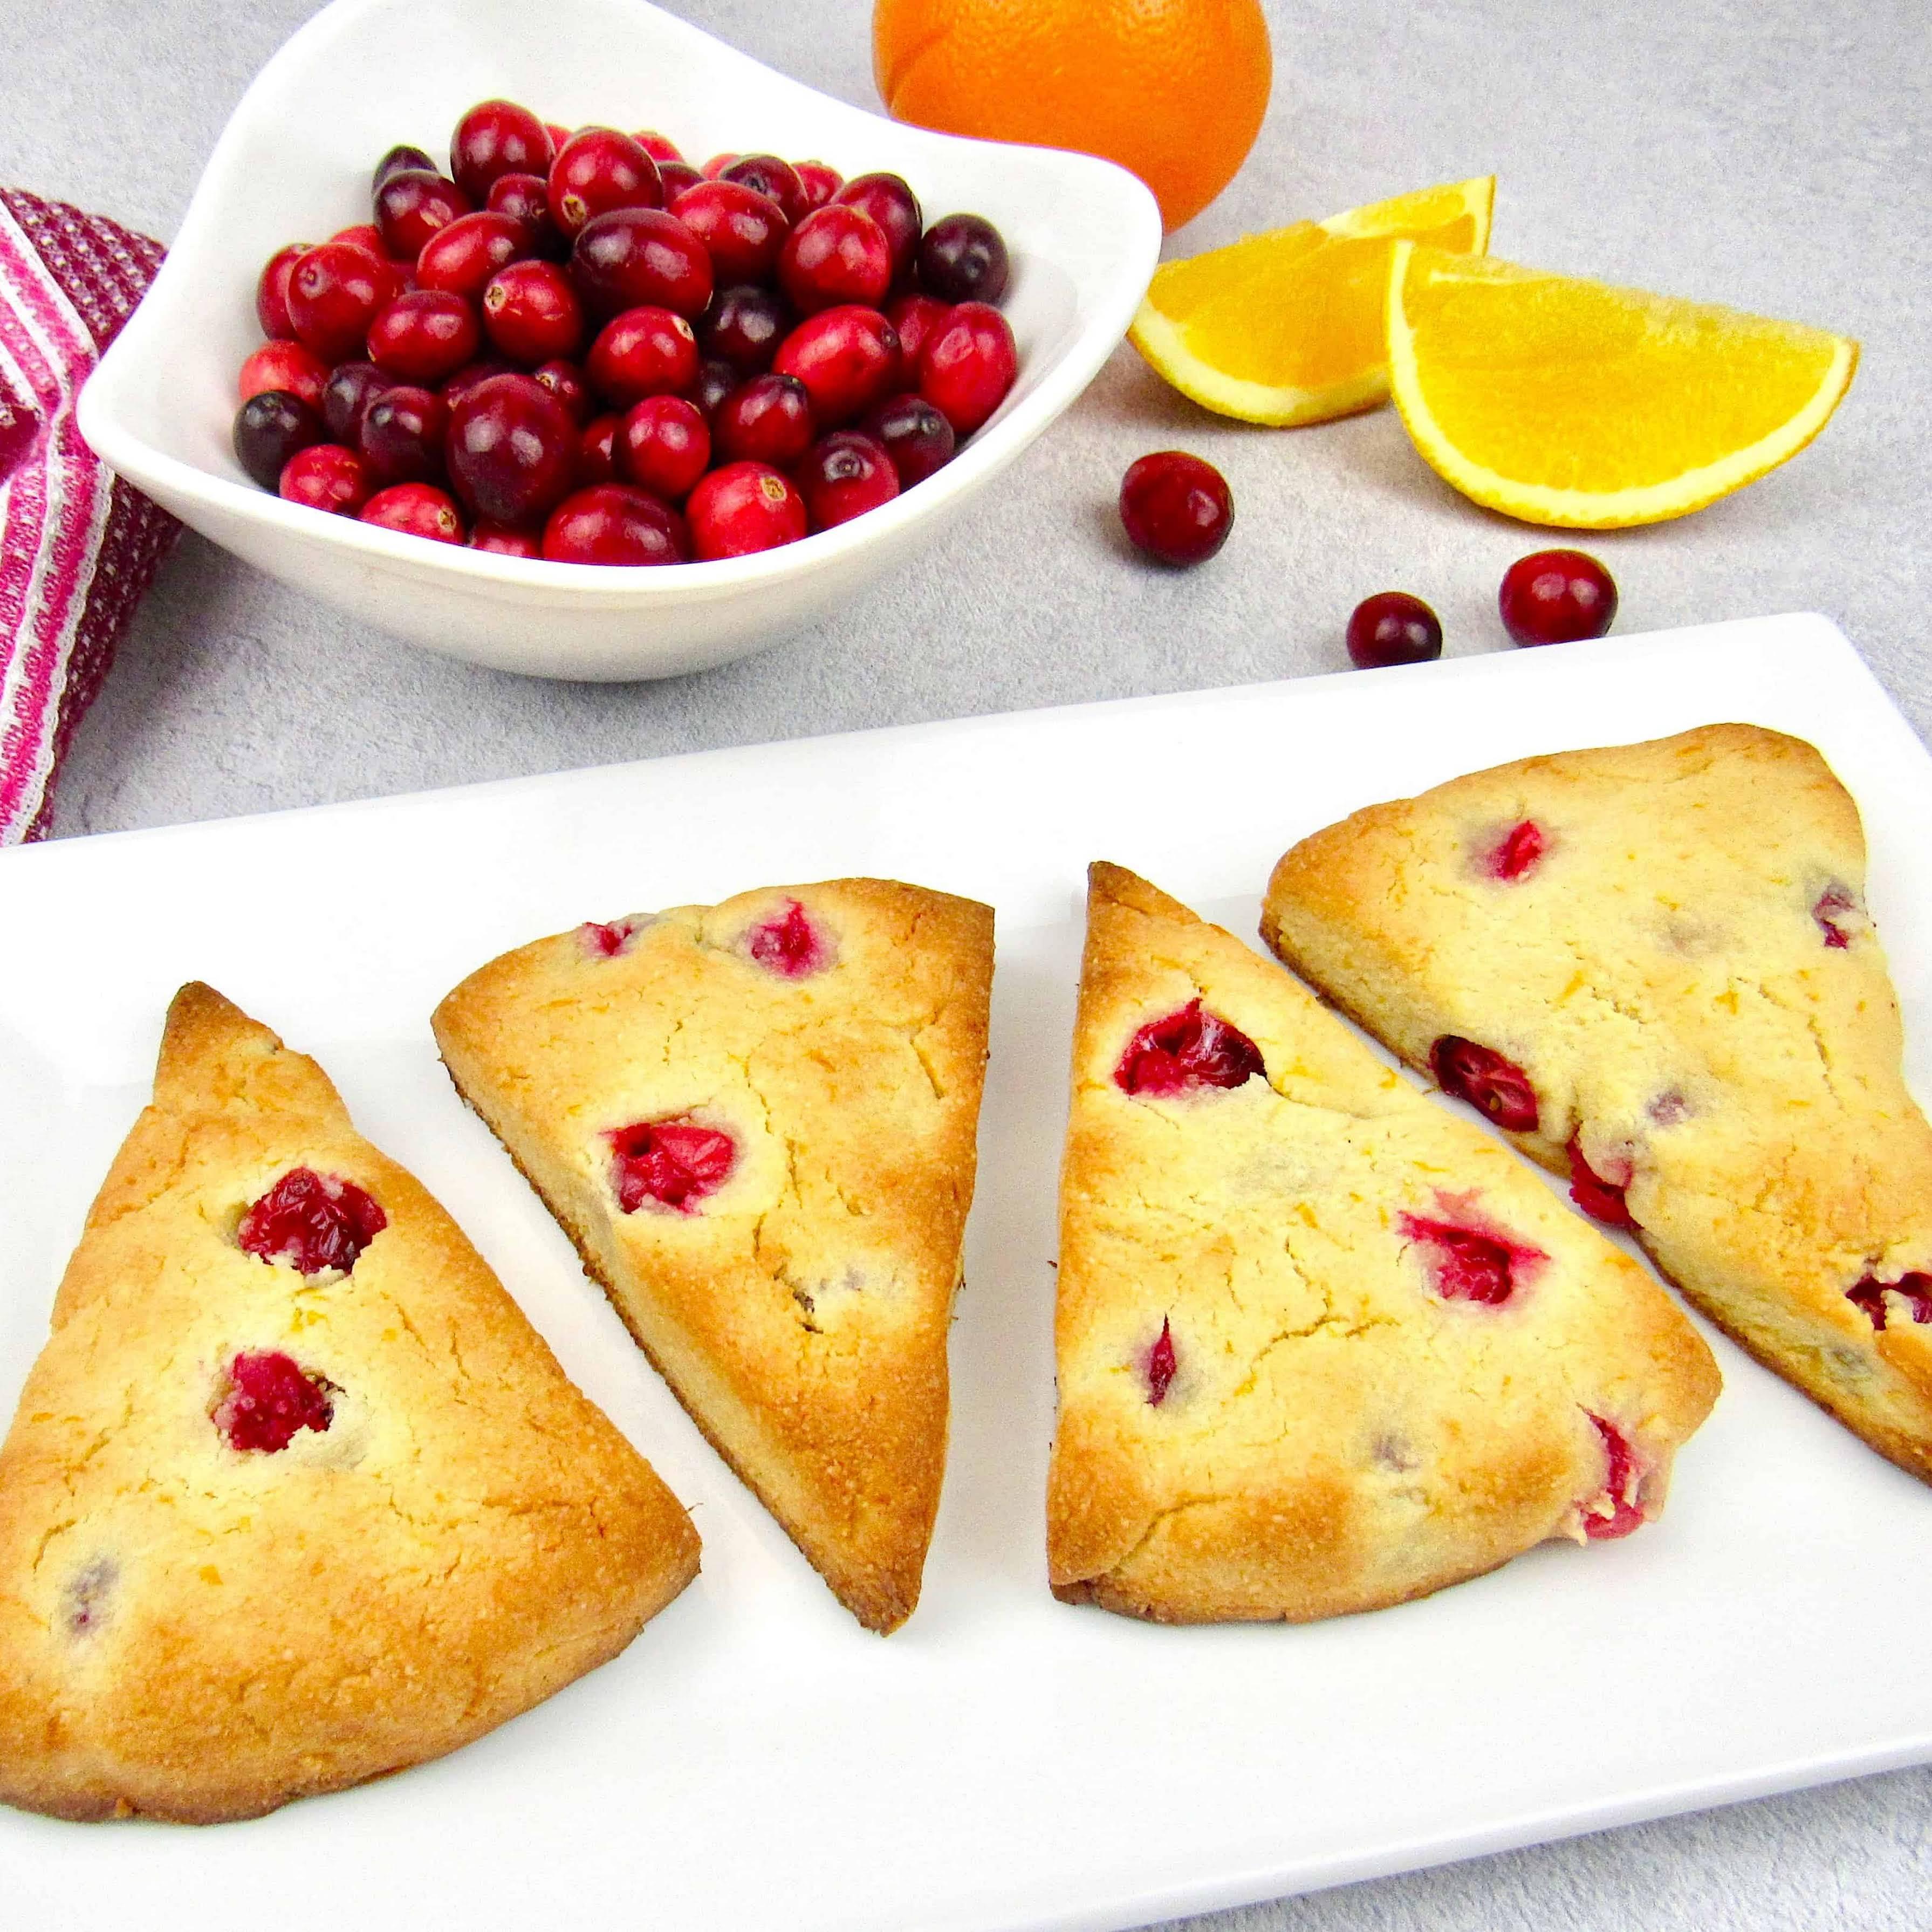 Cranberry Orange Scones - Keto/Low Carb/Gluten & Dairy-Free